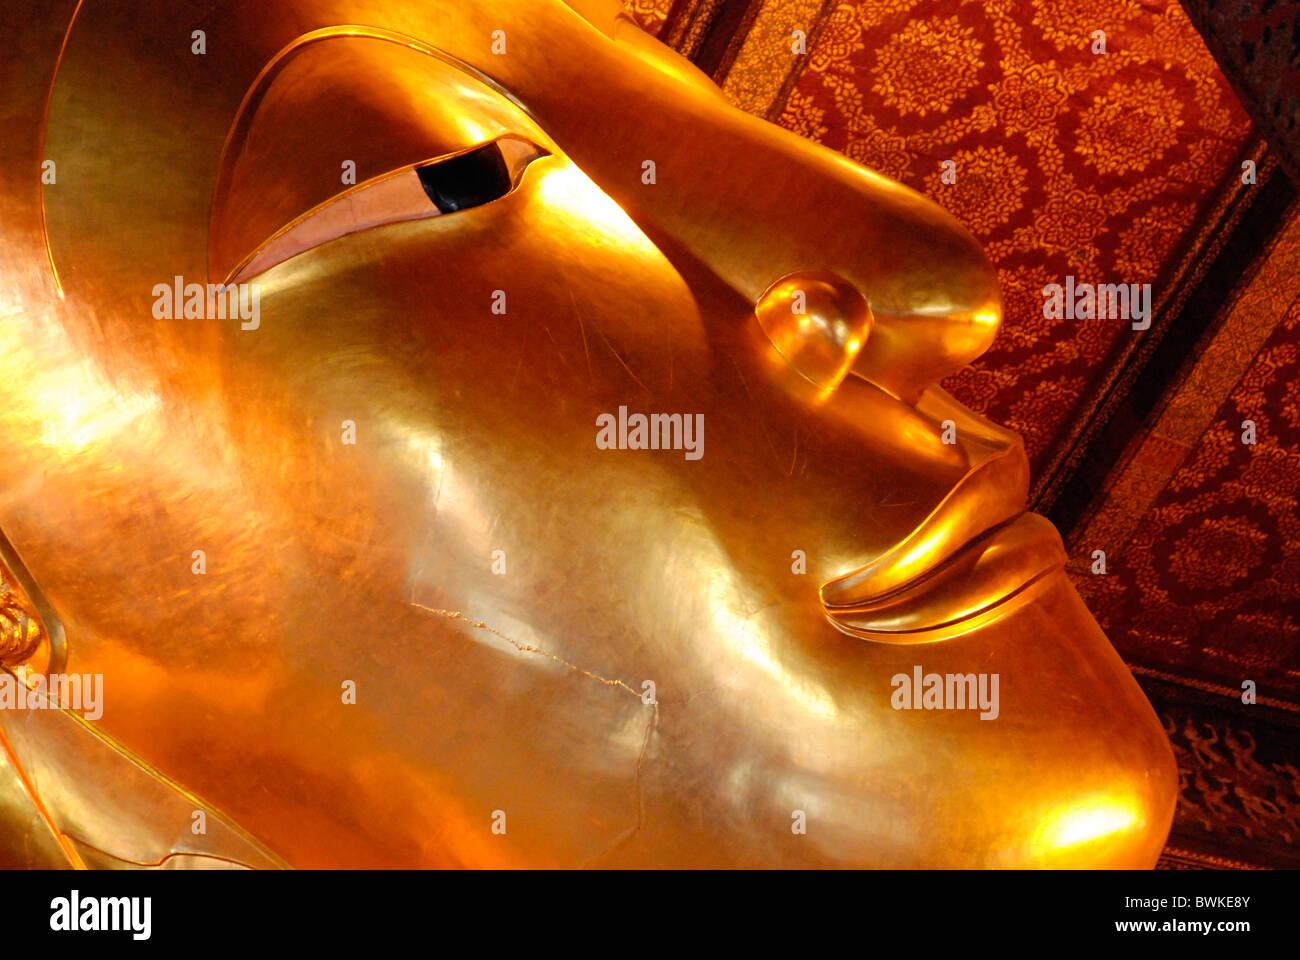 Asia Bangkok Buddha Buddha statue Buddhism Buddhist Buddhist figure face nonviolence belief confidence Gol - Stock Image